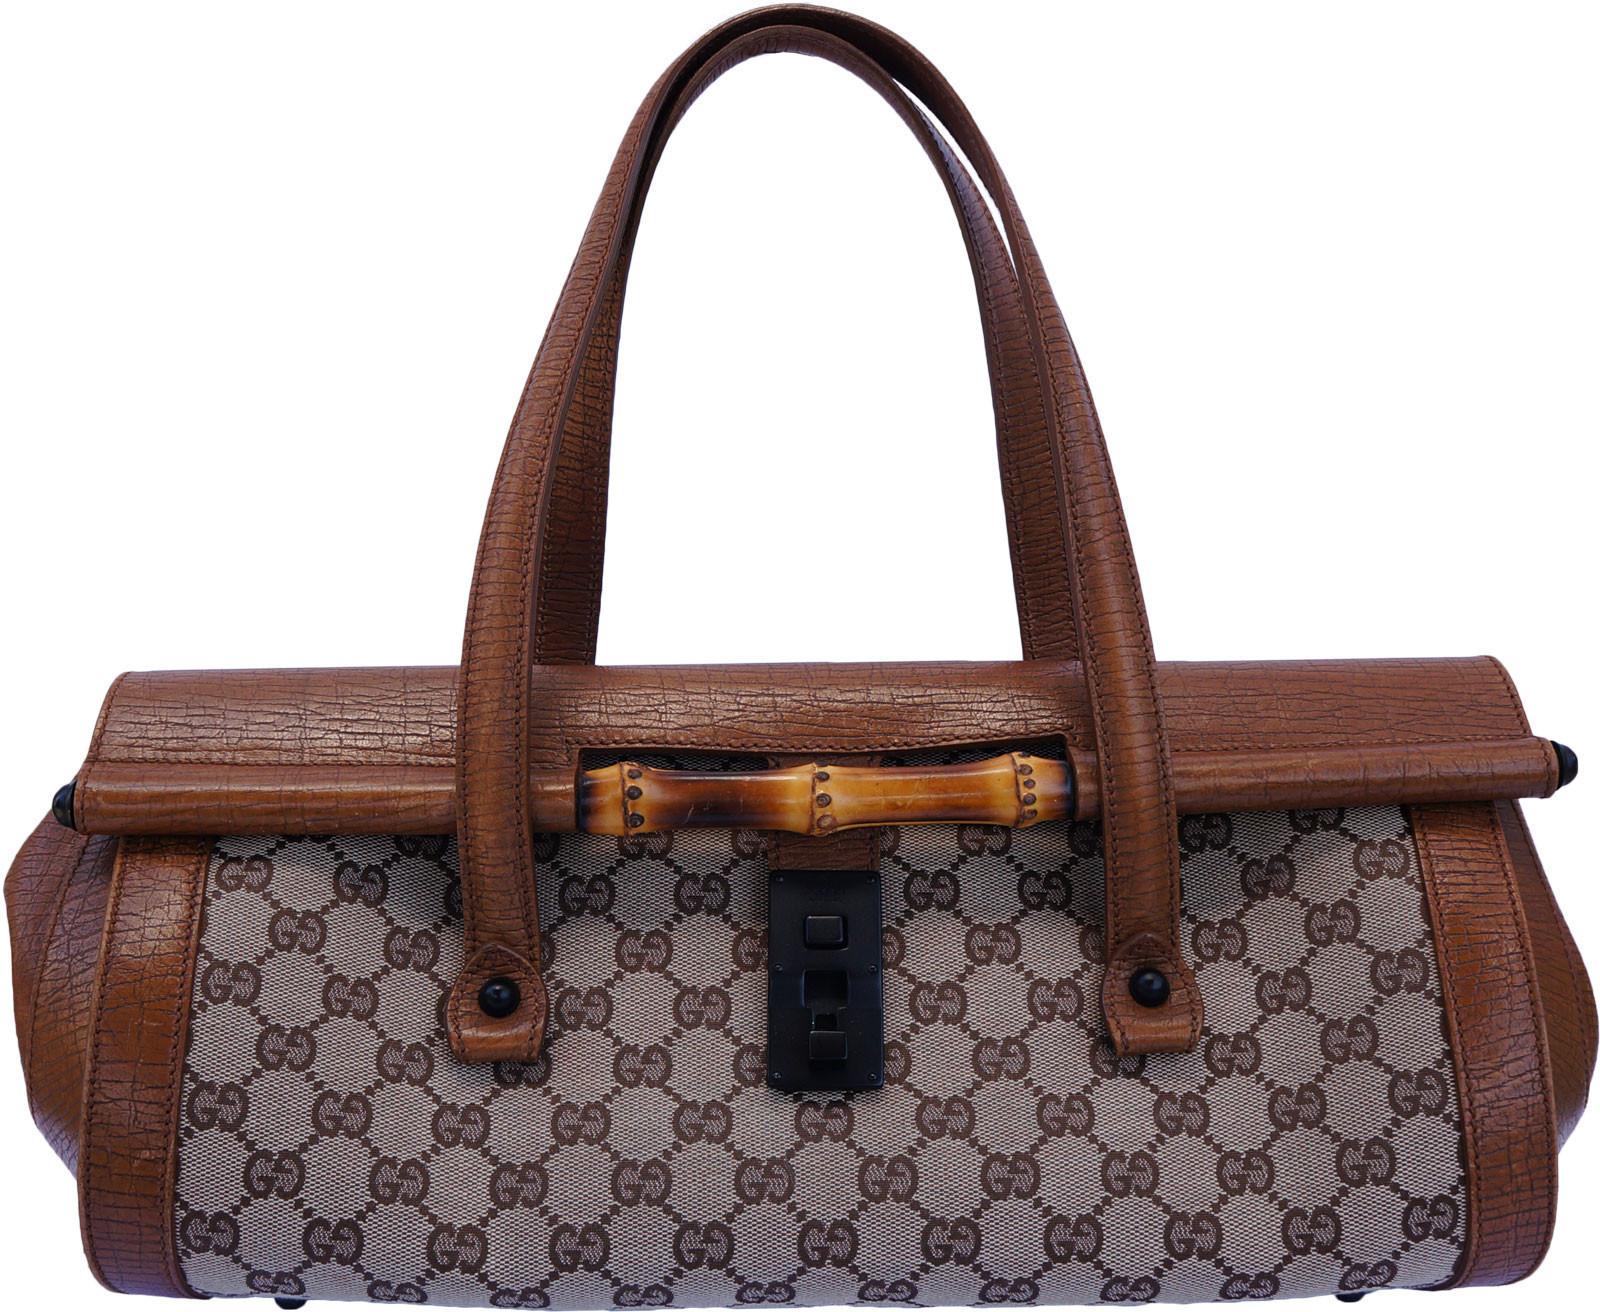 9a1aed66e29ca Gucci Bamboo Bullet Bag Shoulder Gg Brown Gray